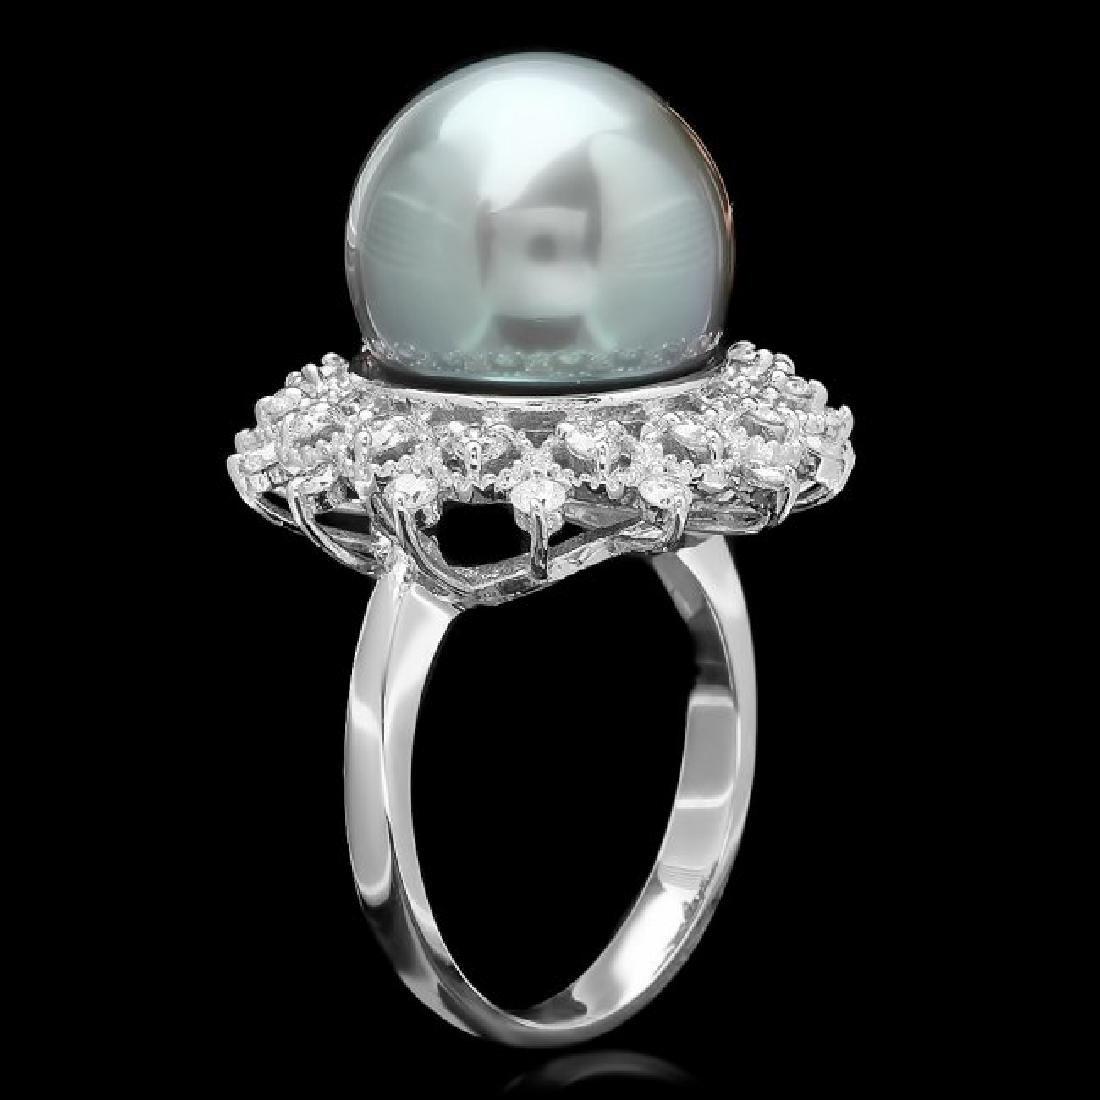 14k White Gold 13mm Pearl 0.60ct Diamond Ring - 2